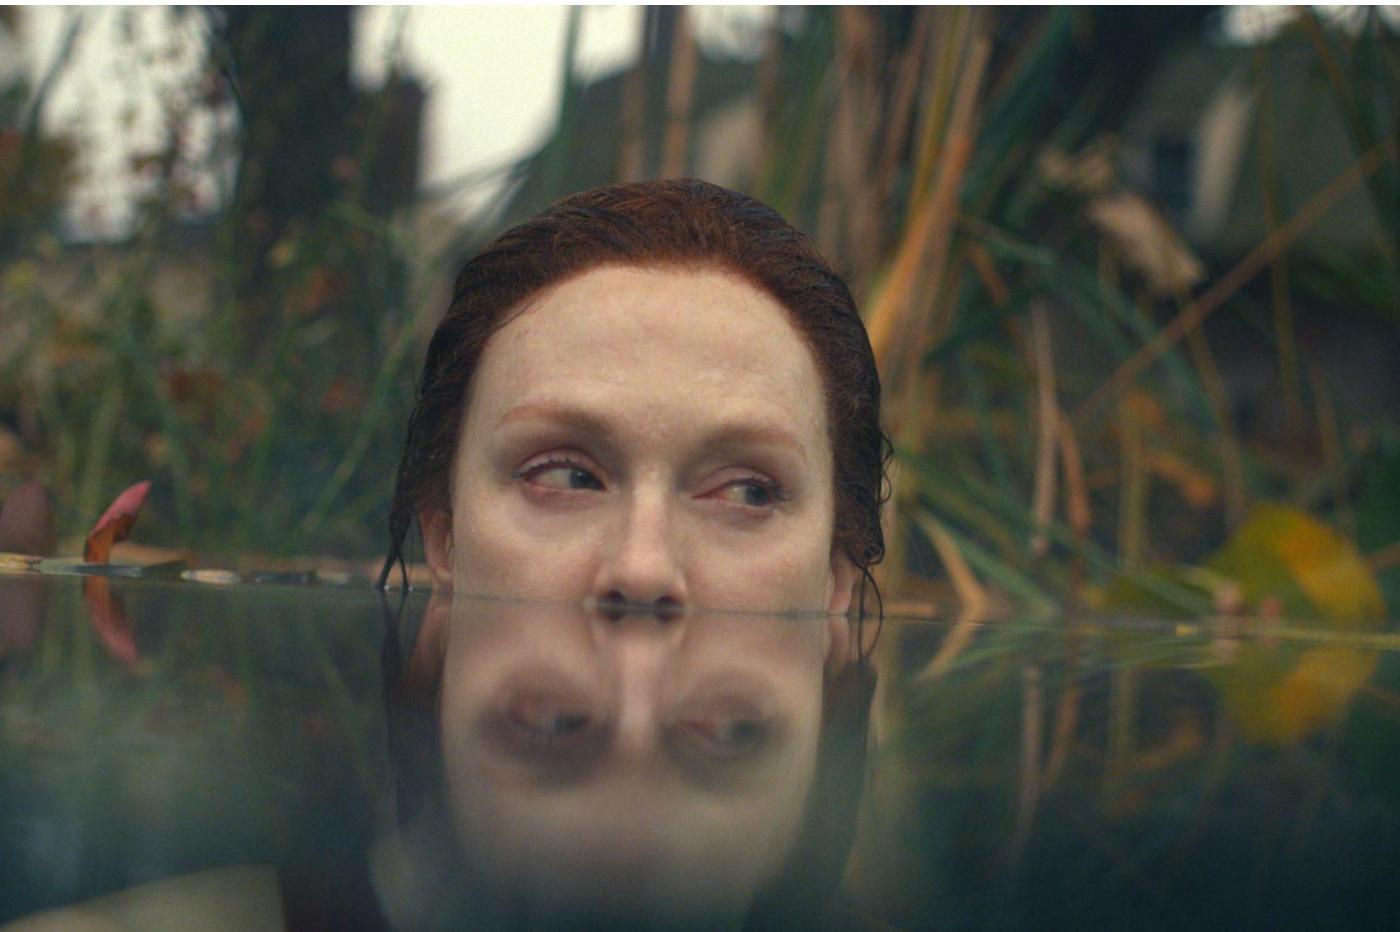 Julianne Moore incarne Lisey dans la série Apple TV+ Lisey's Story